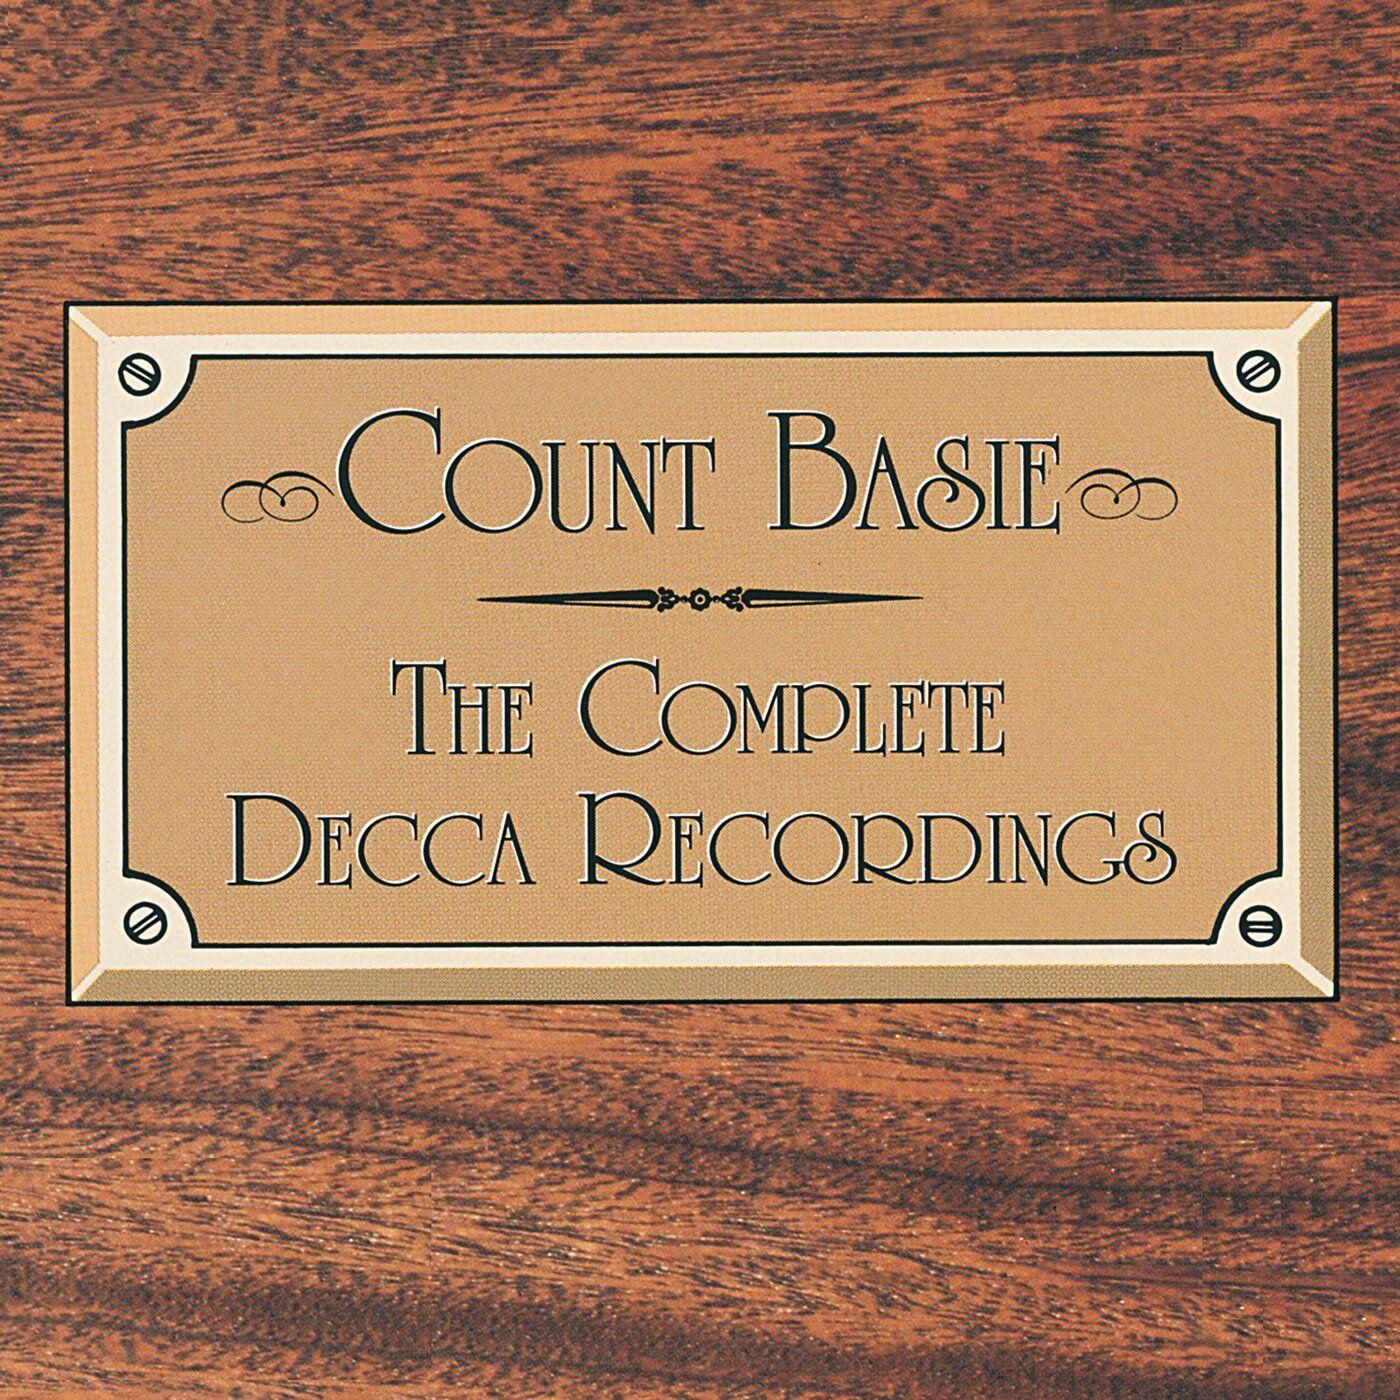 Count Basie – The Complete Decca Recordings (GRP/Decca)